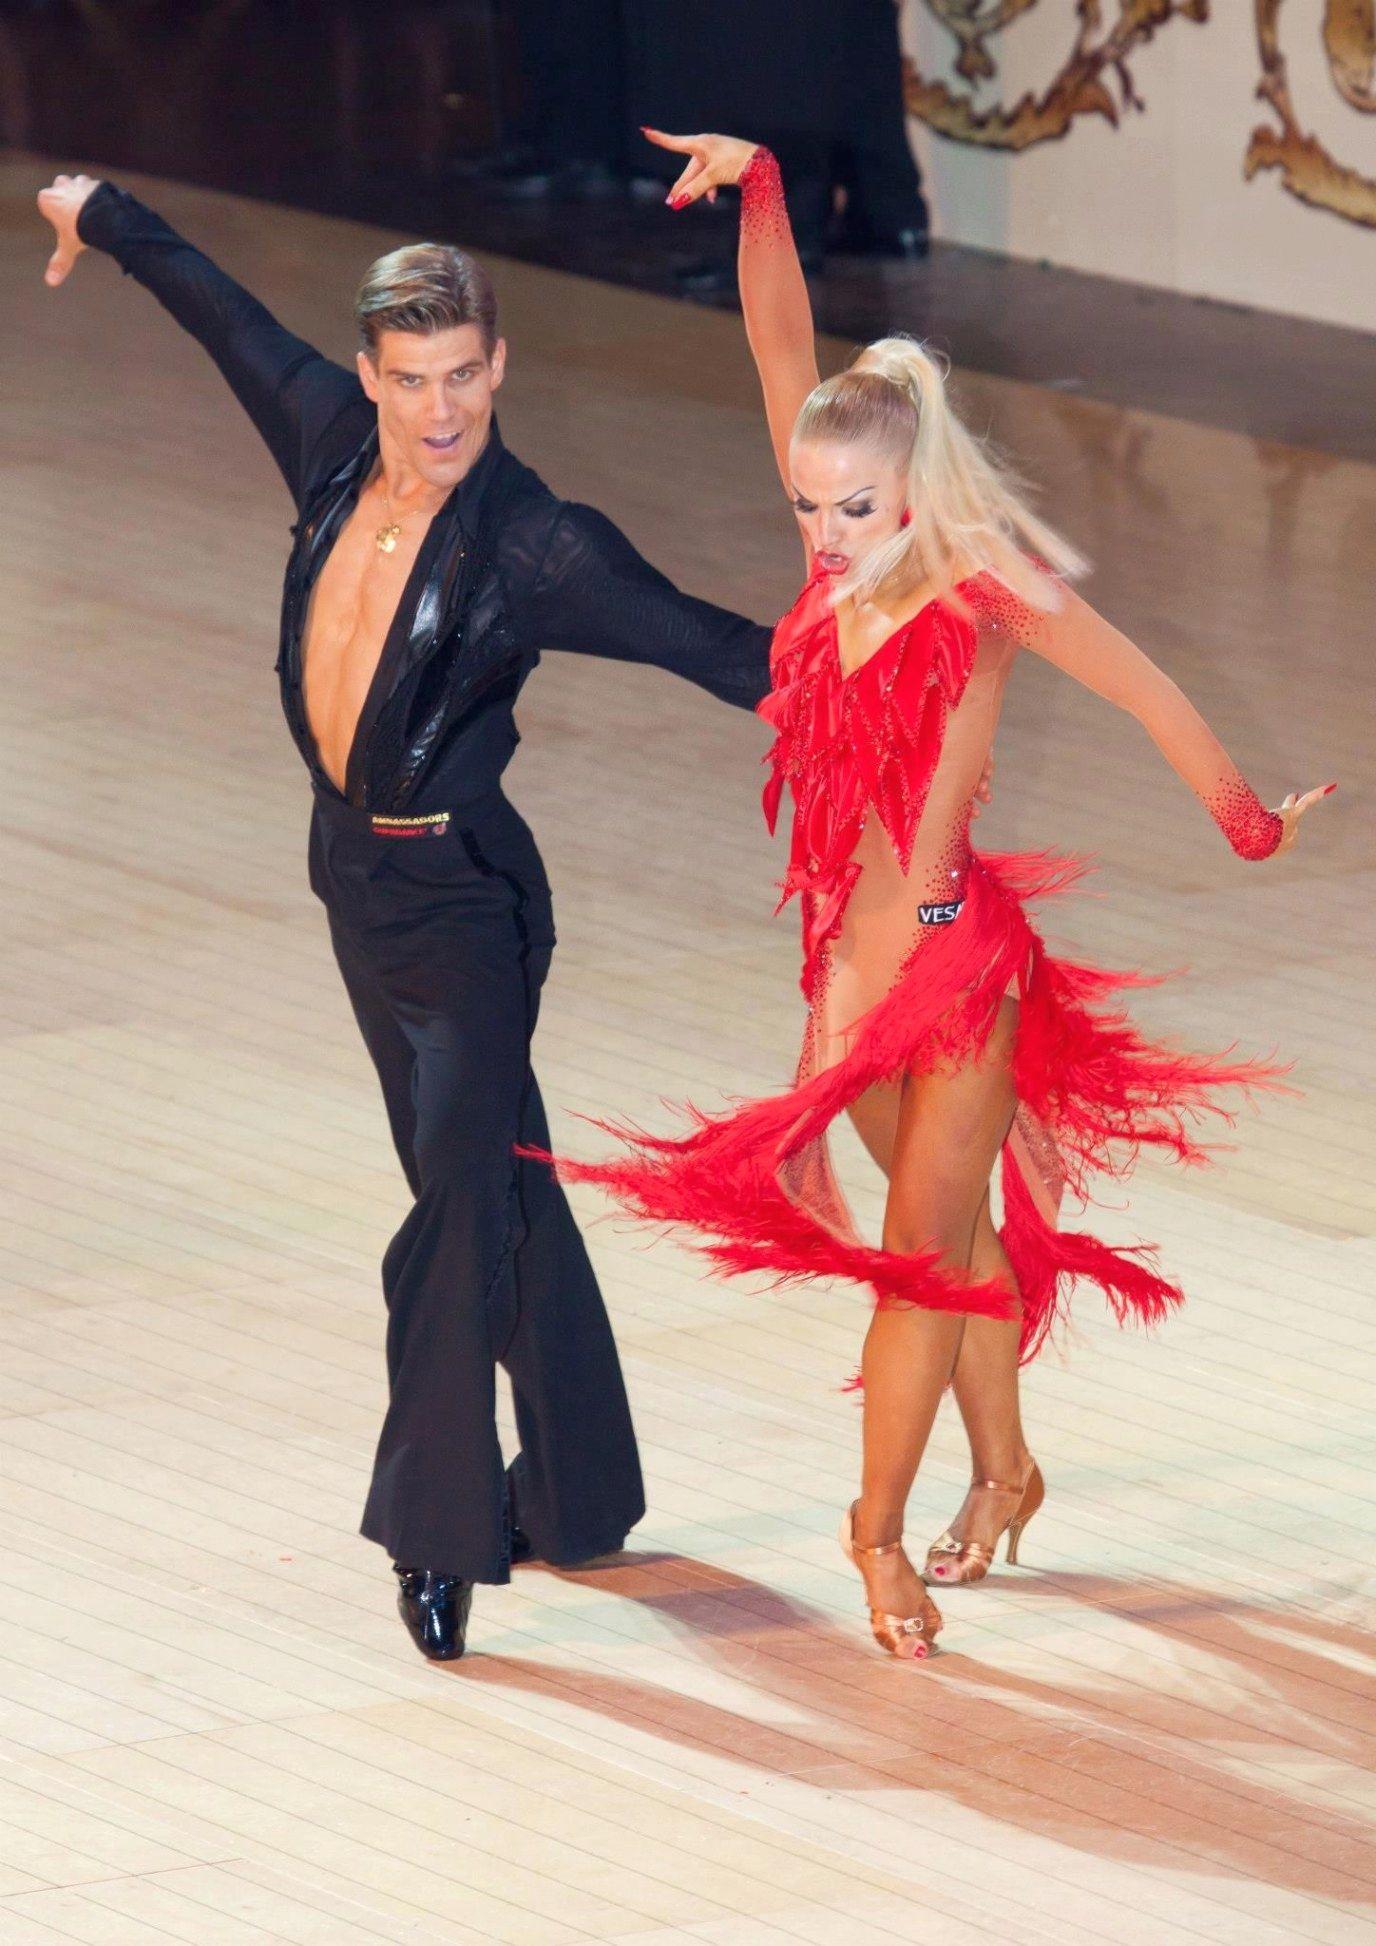 Ballroom Dancing Znaczenie. Ballroom dancing really is as ...